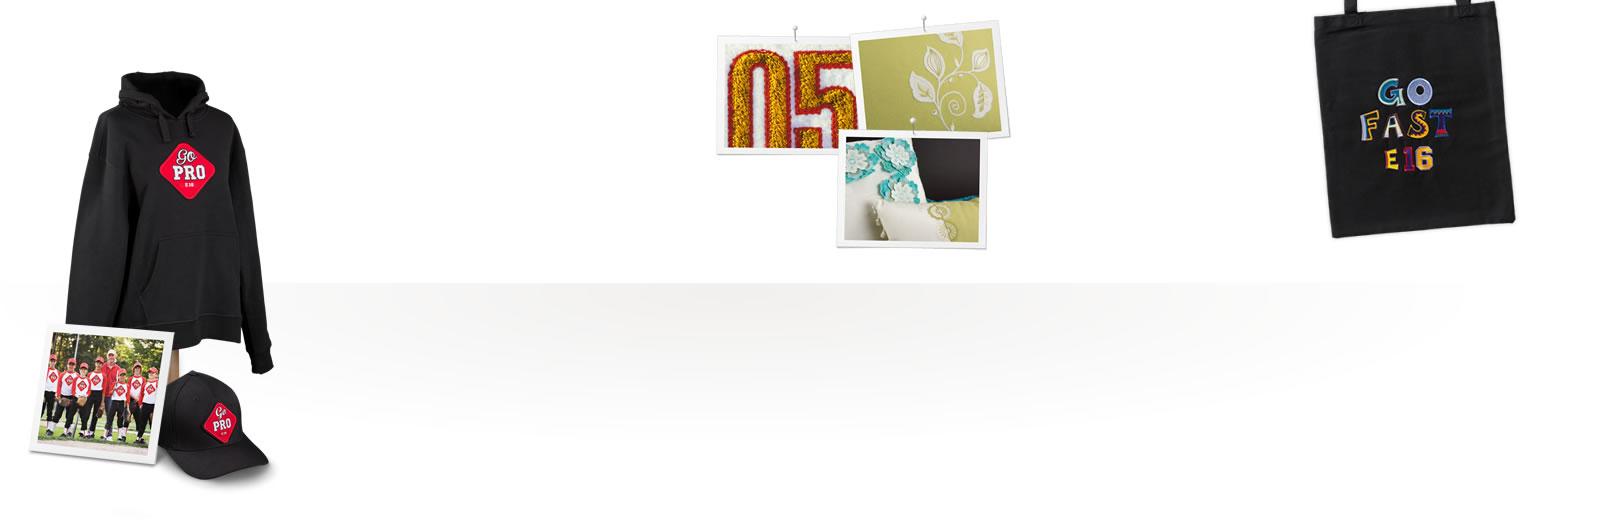 bernina e16 embroidery machine